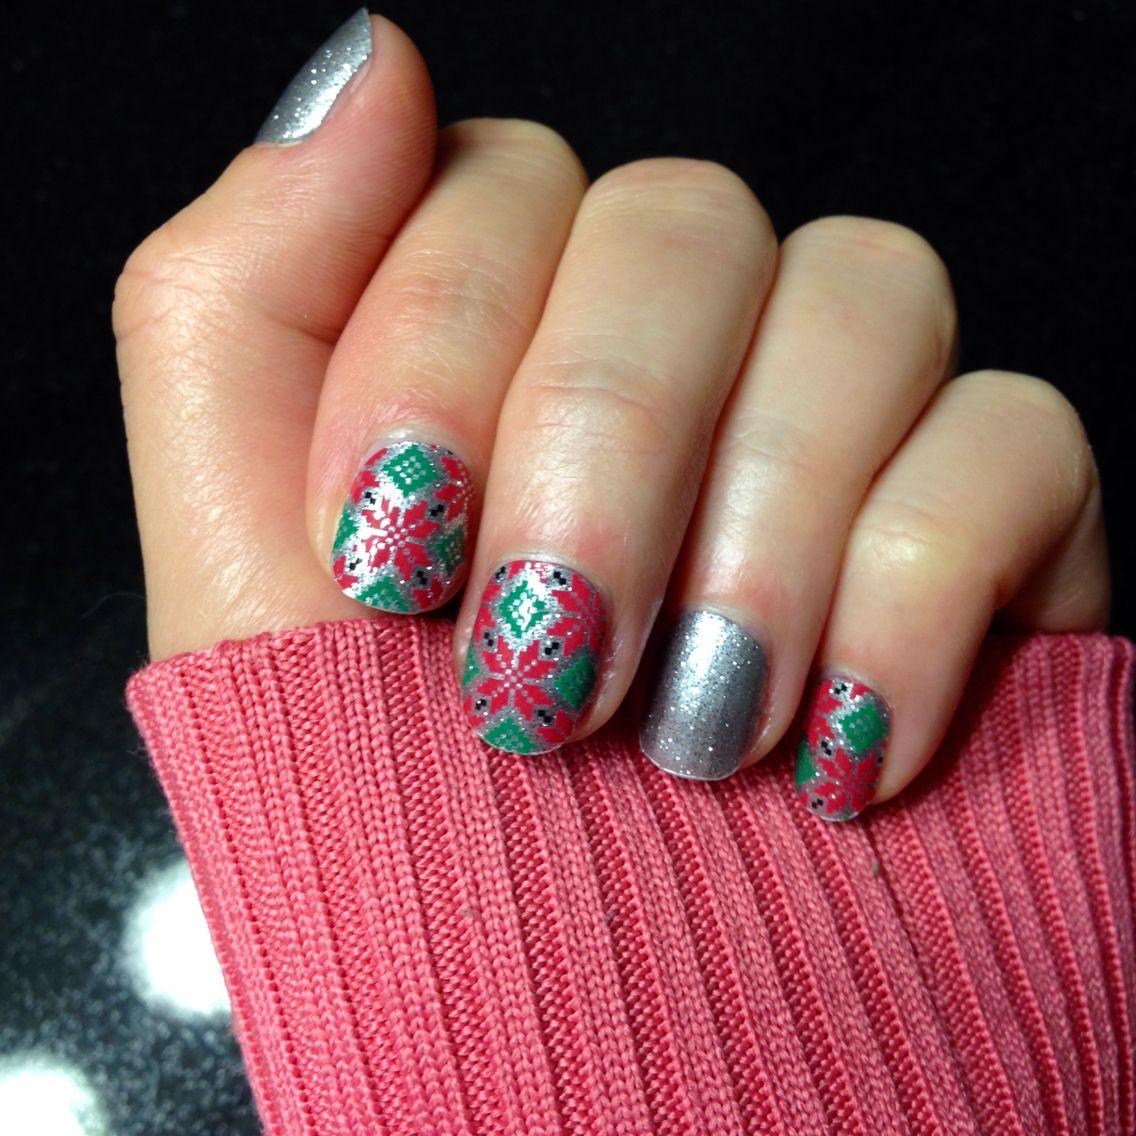 Poinsettia and Diamond Dust Sparkle jamberry nails ...